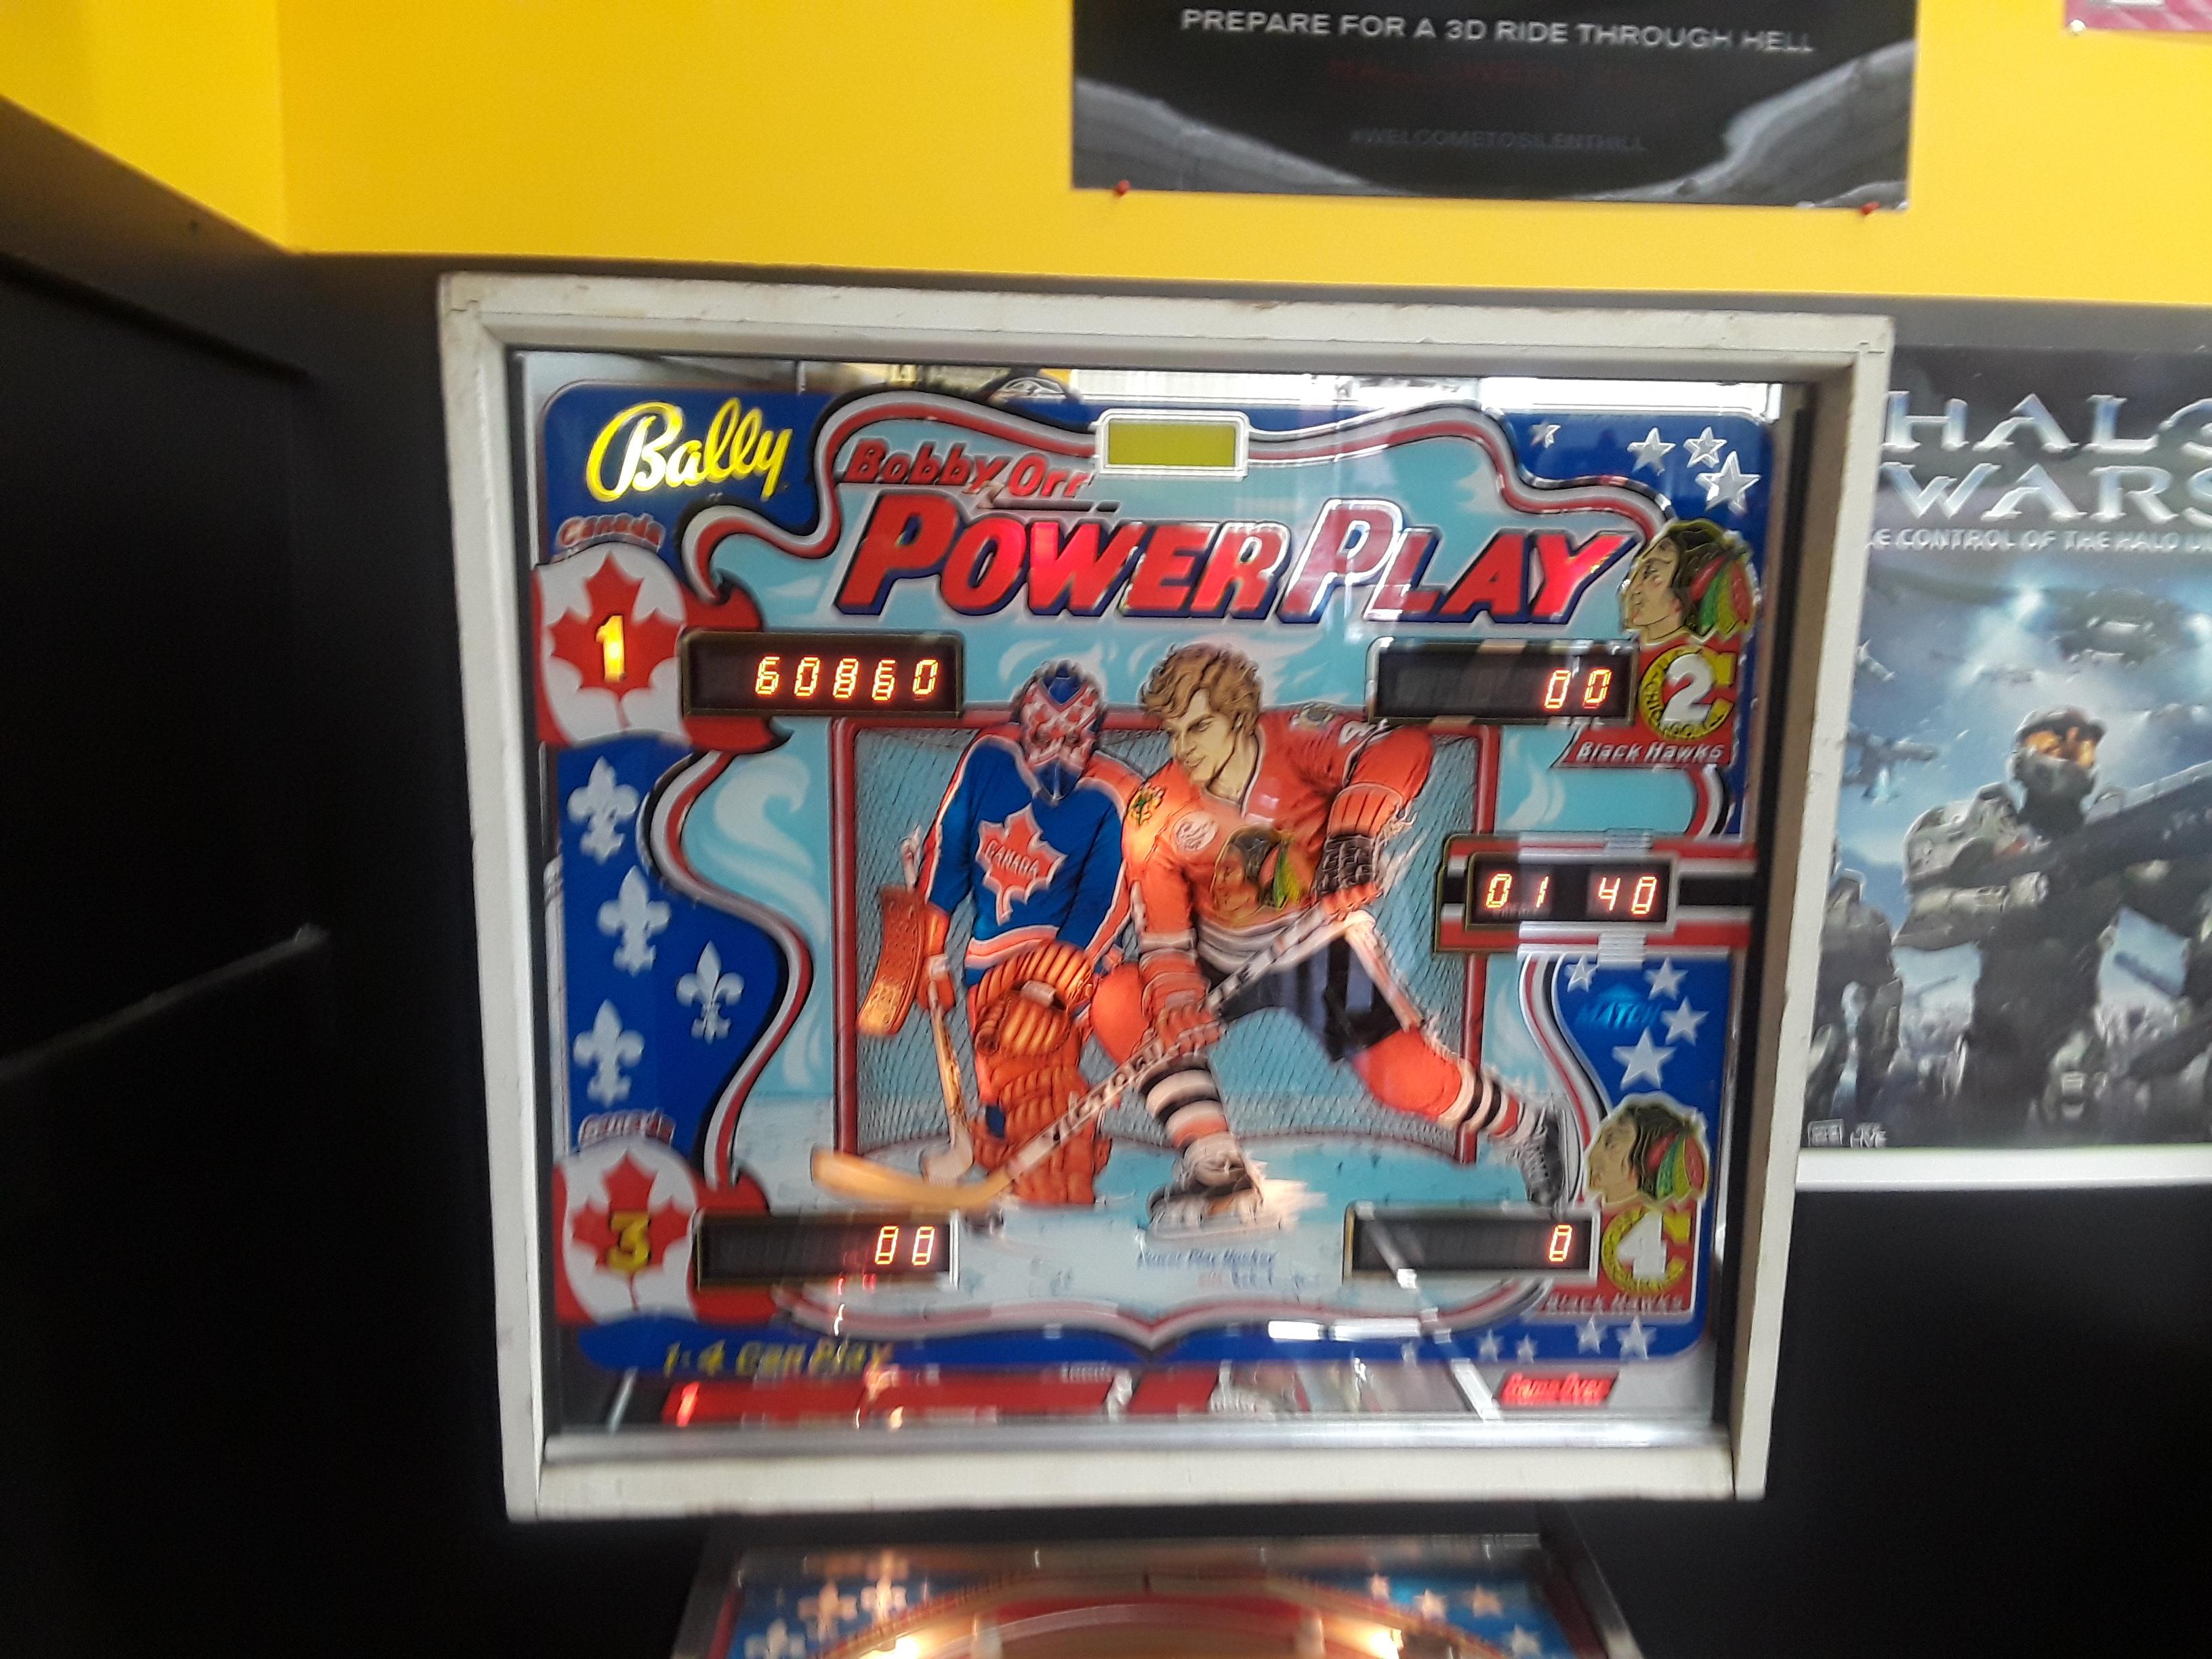 JML101582: Power Play [aka Bobby Orr Power Play] (Pinball: 5 Balls) 60,860 points on 2018-08-04 00:13:06